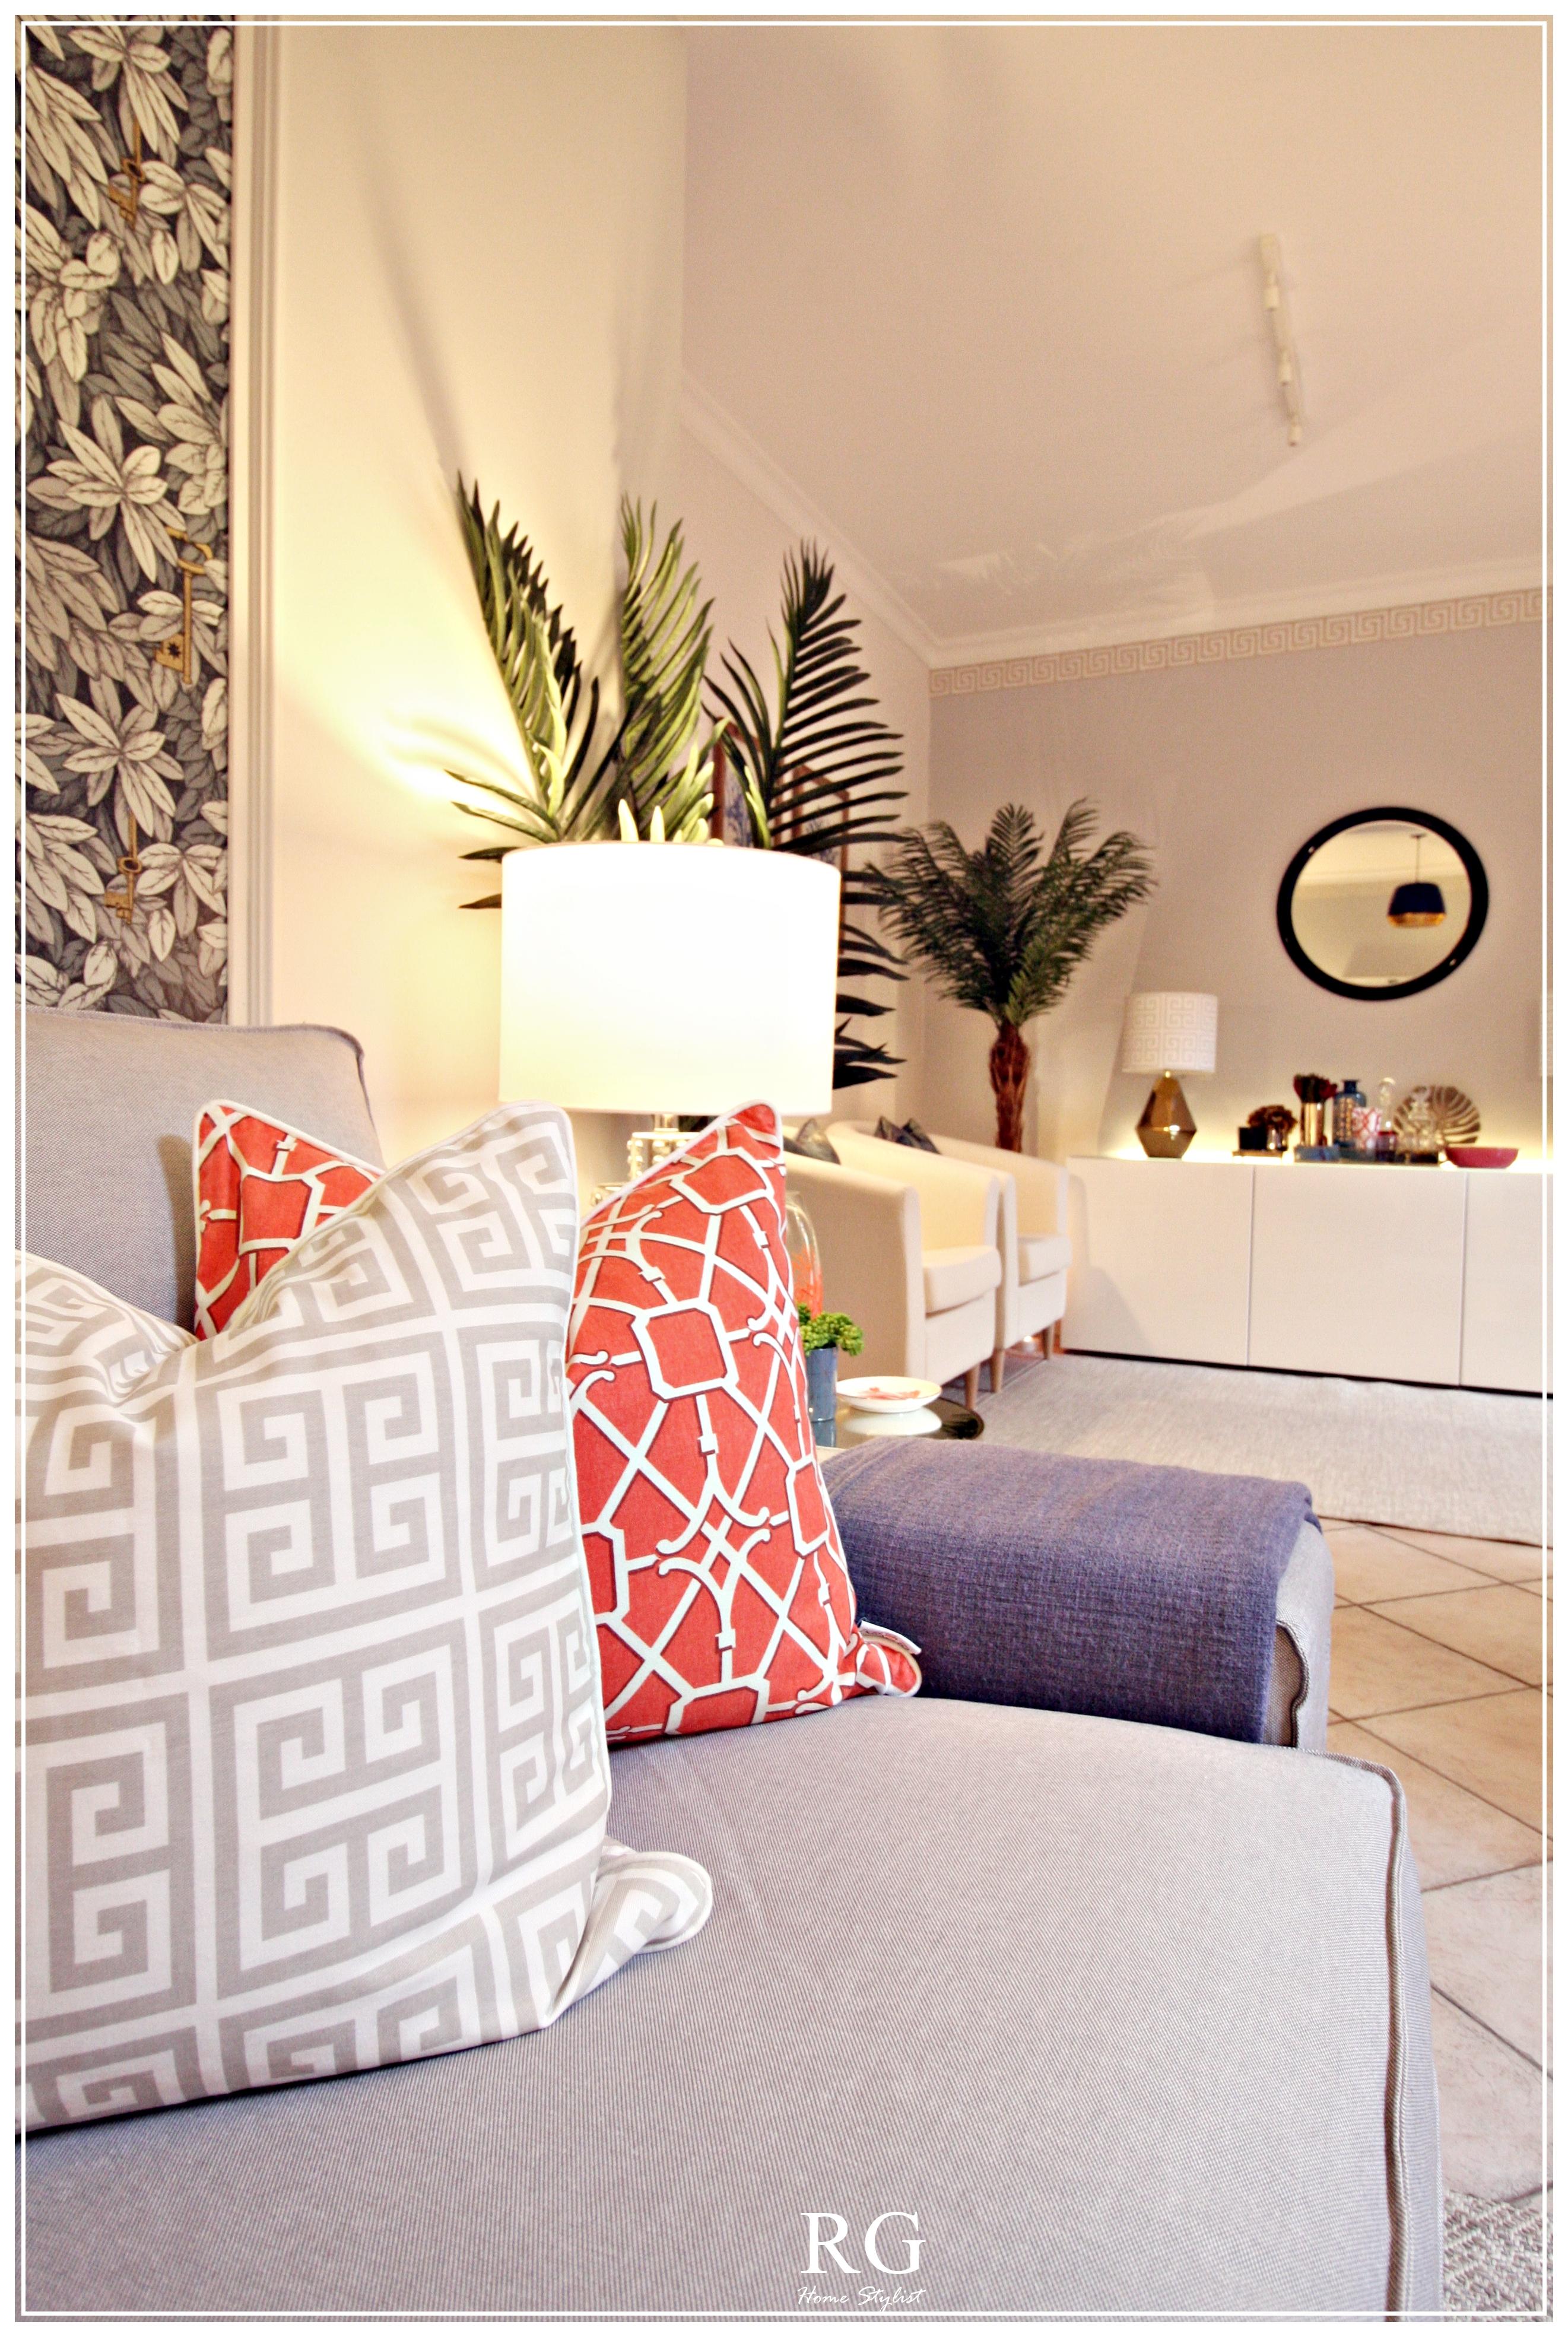 Projeto - The coral palms